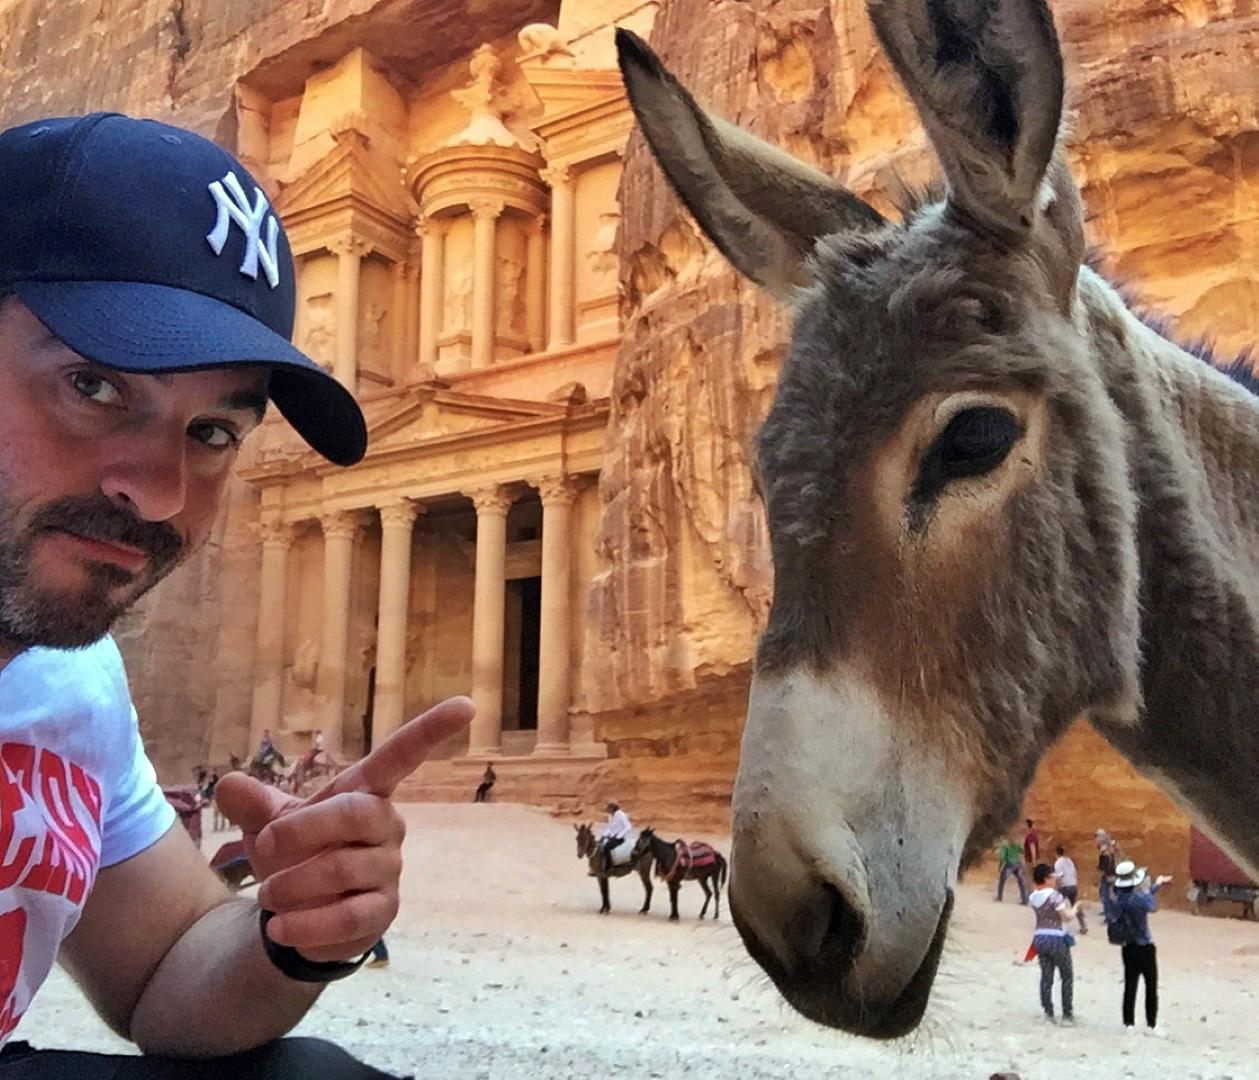 Es seguro viajar a Jordania jordania - 27261473112 fcdac31baa o - ¿ Es seguro viajar a Jordania ?